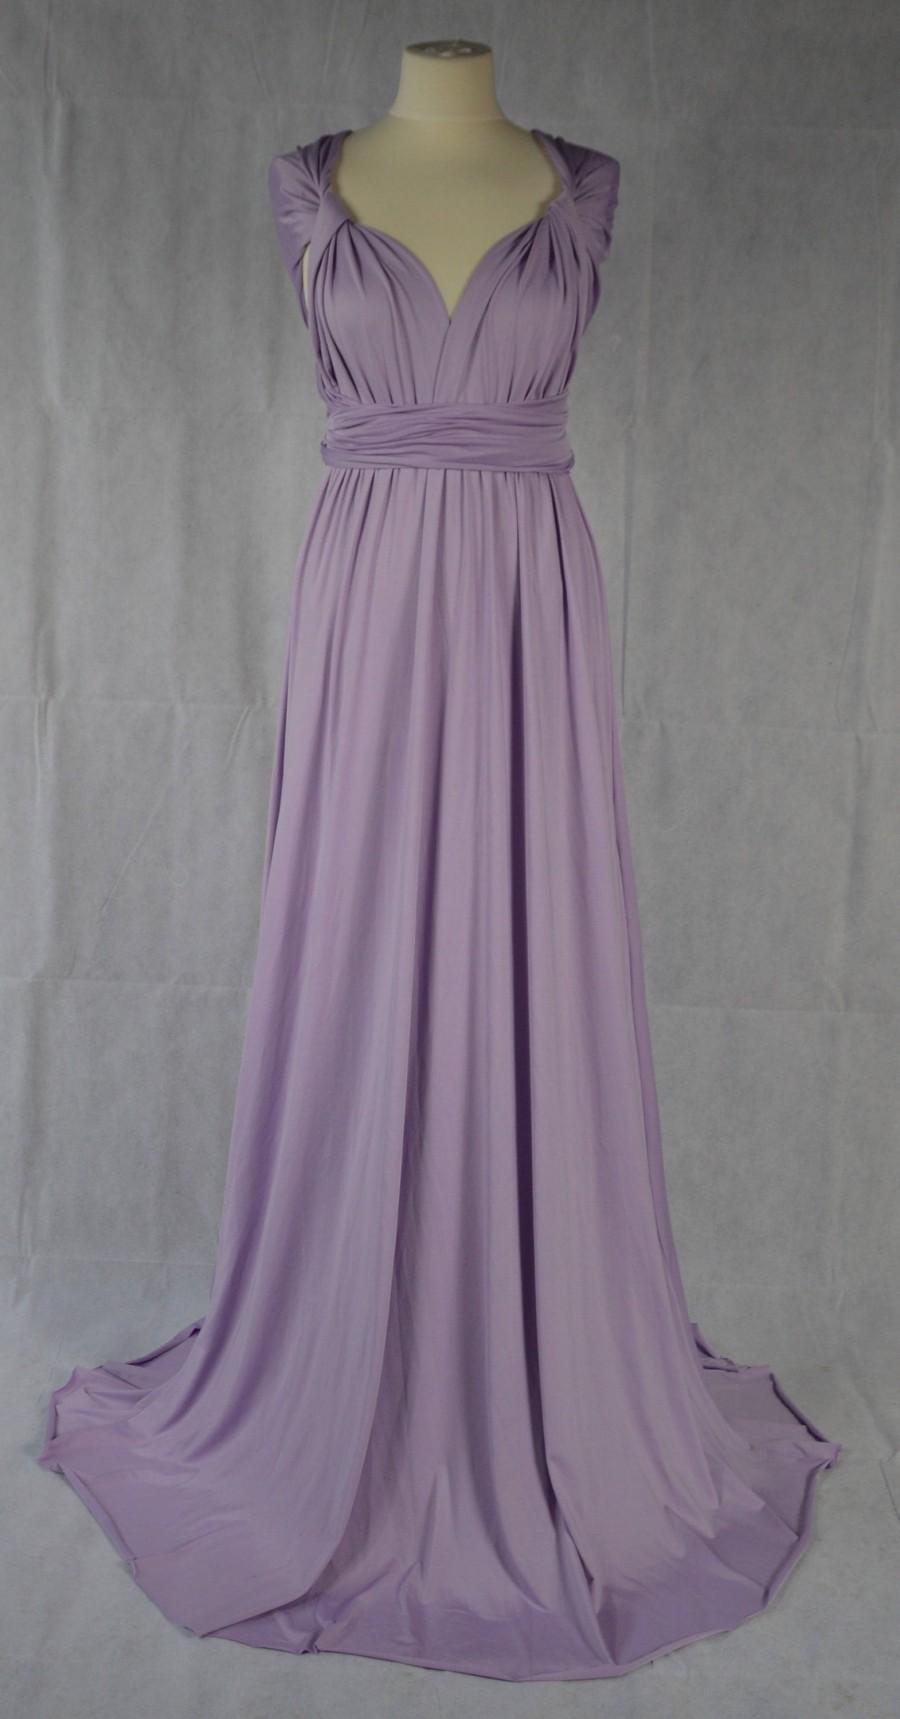 Wedding - Bridesmaid Dress Multiway Dress Convertible Dress Twist Wrap Dress Infinity Dress Wedding Prom Evening Lilac One Size Fits All